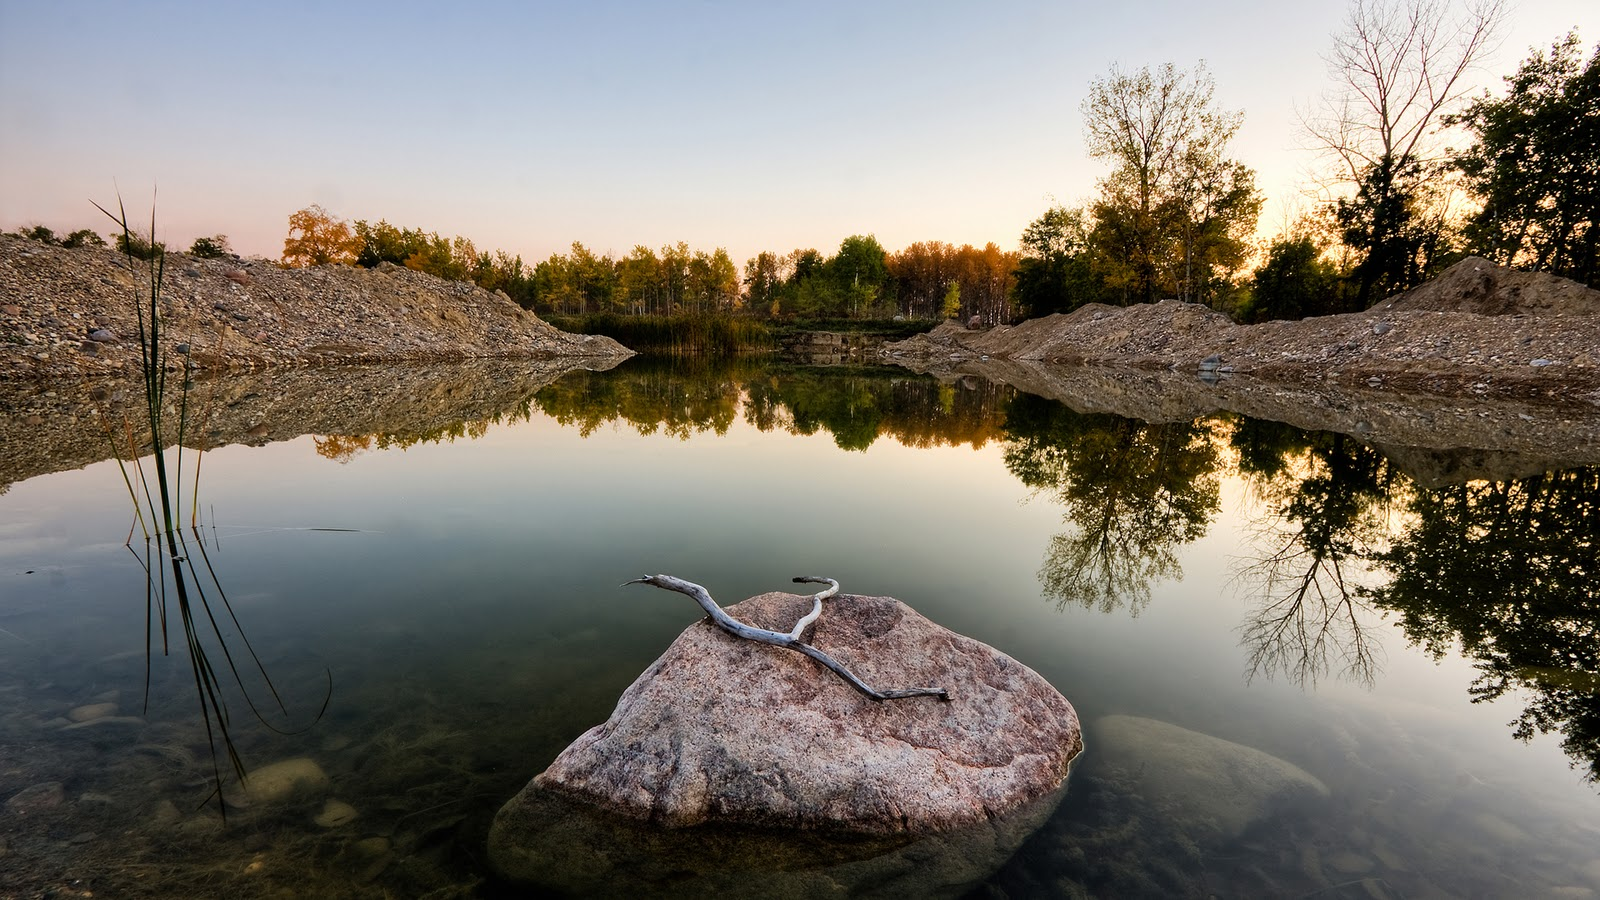 44 tane 1080p HD Manzara resimleri - 1080p HD Nature Wallpapers, HD Wallpapers | Rooteto